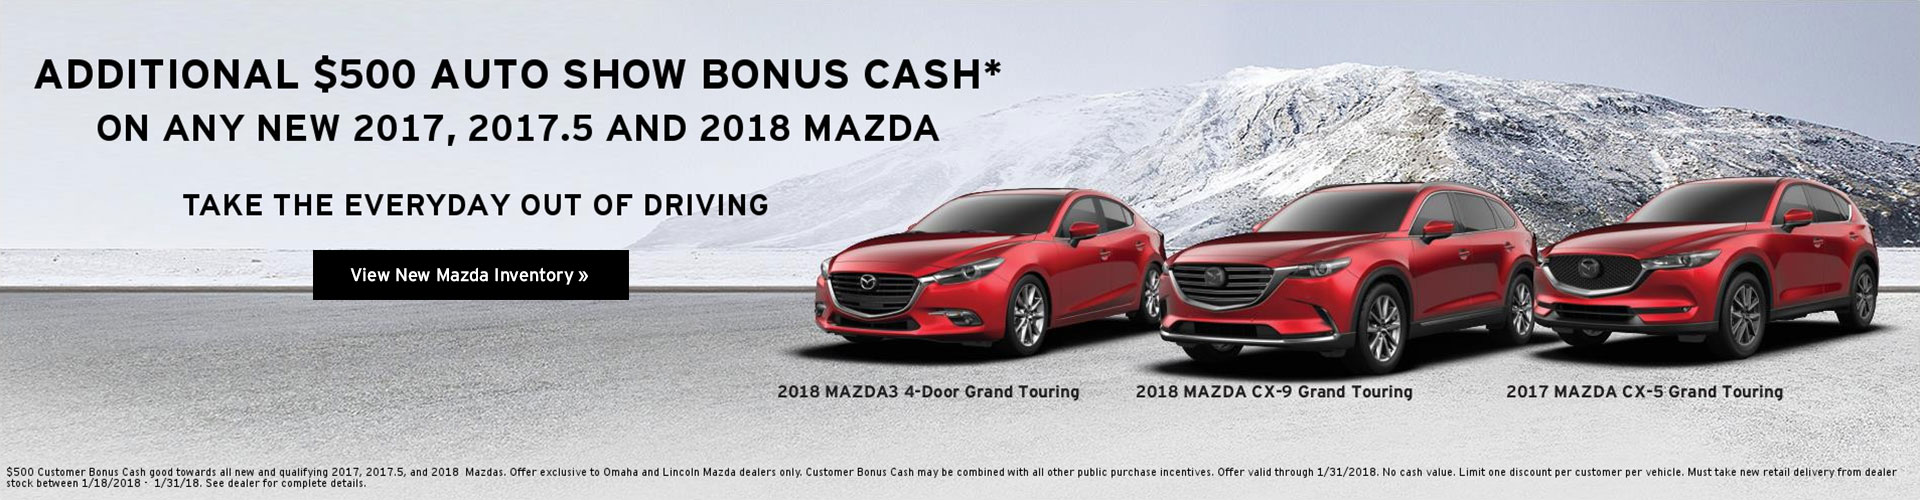 Midlands International Auto Show $500 Customer Bonus Cash